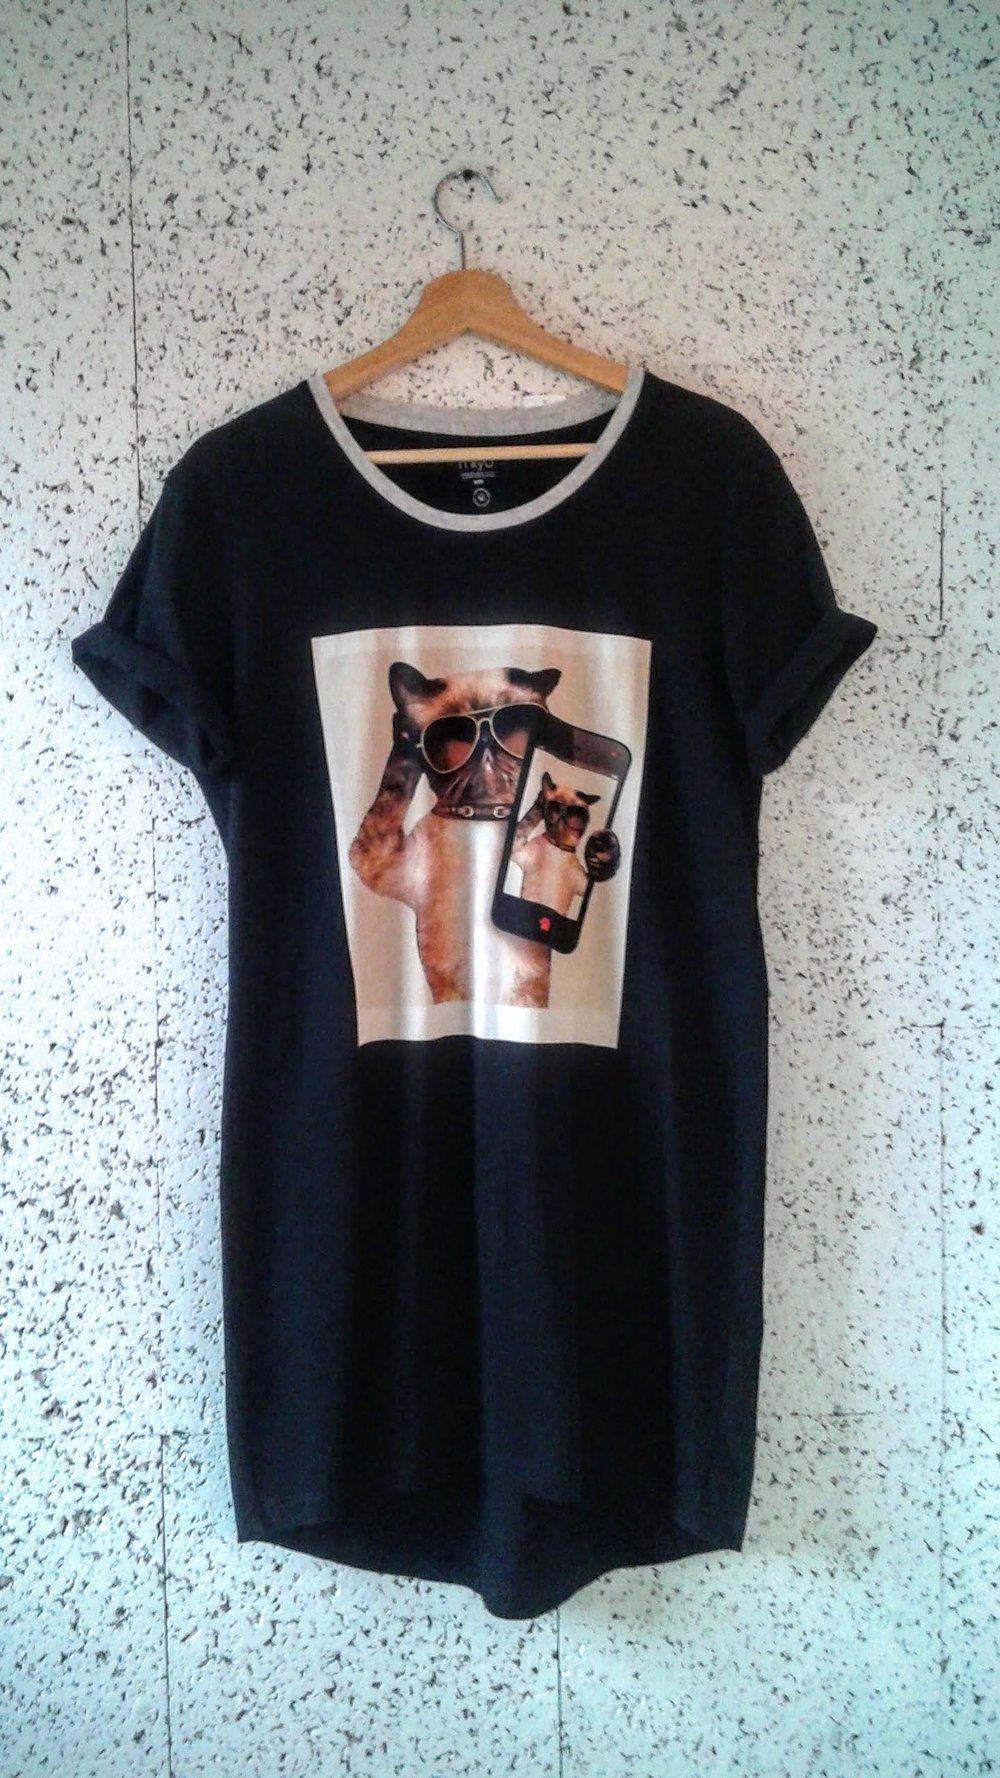 Miiyu top; Size M, $28